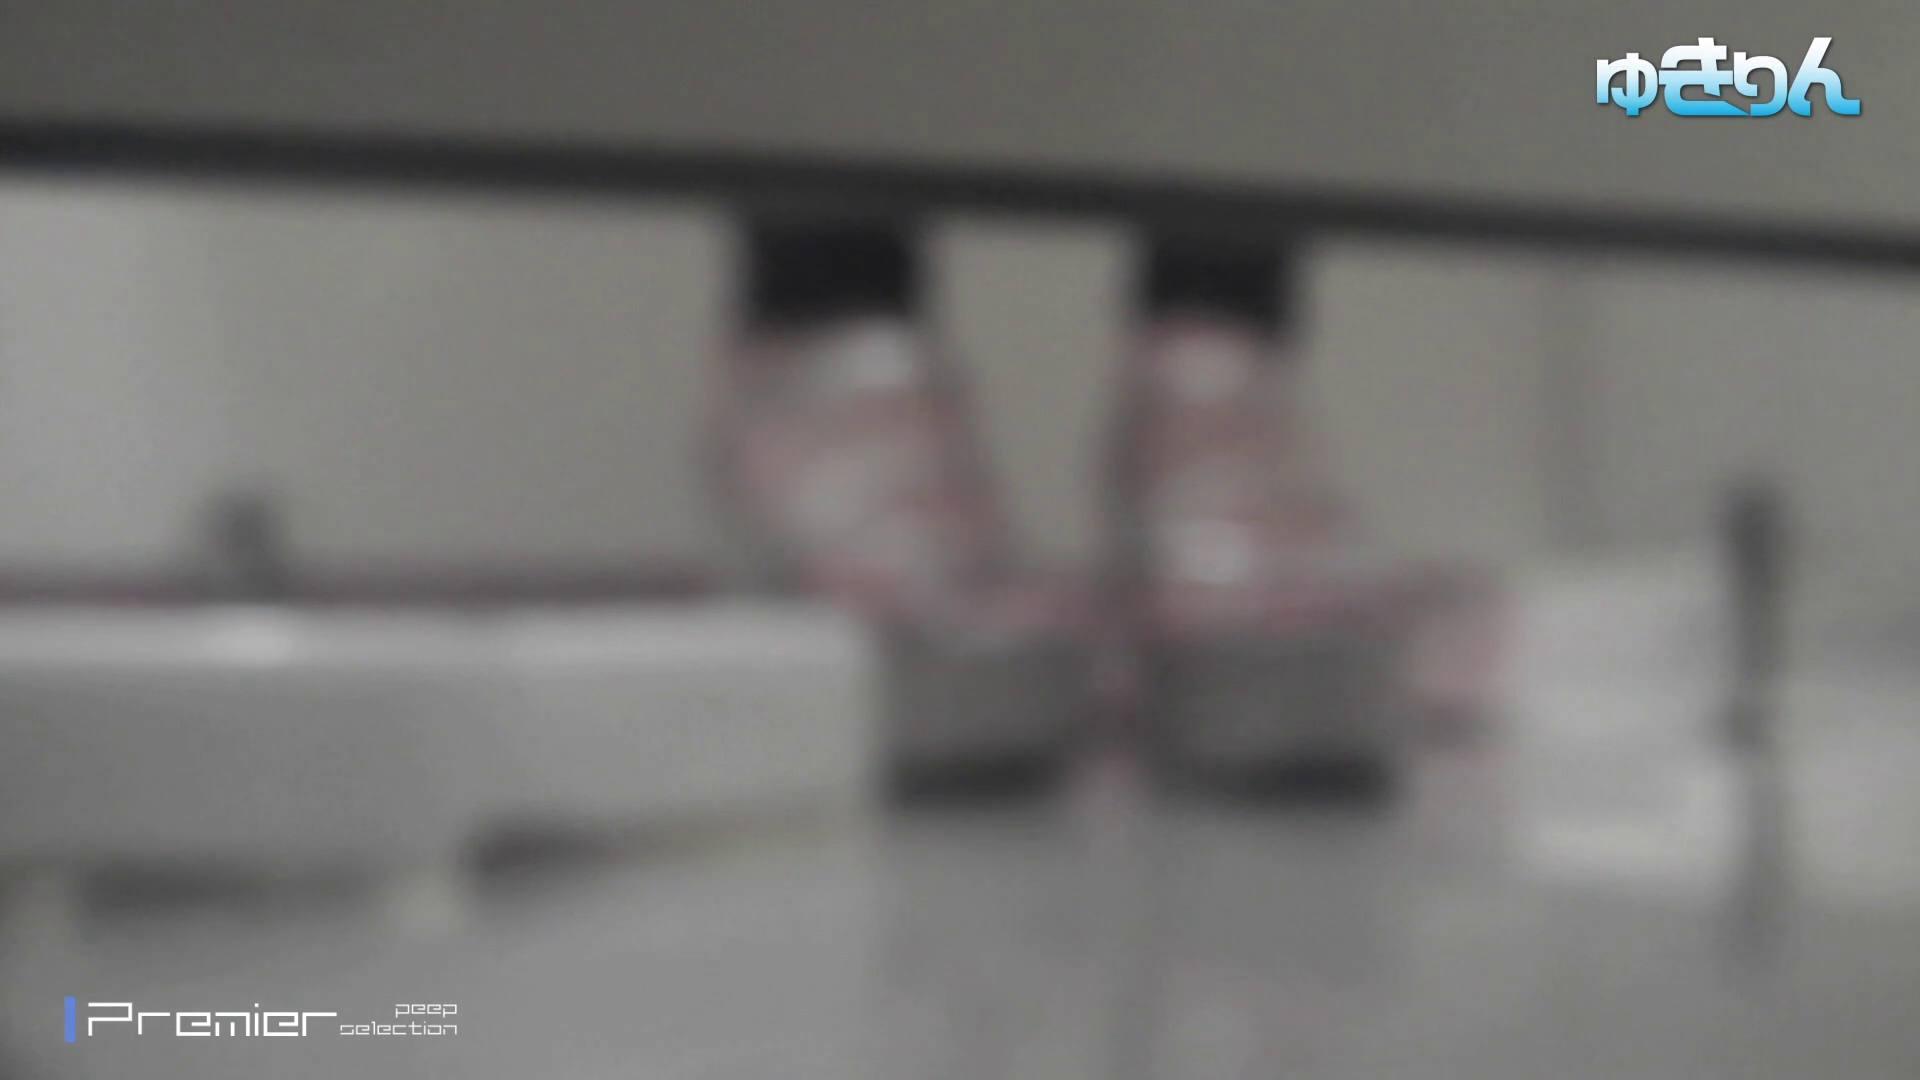 cm友達同士三人グループの二人を同時に捕獲【新世界の射窓からNo120】 丸見え AV動画キャプチャ 92画像 35